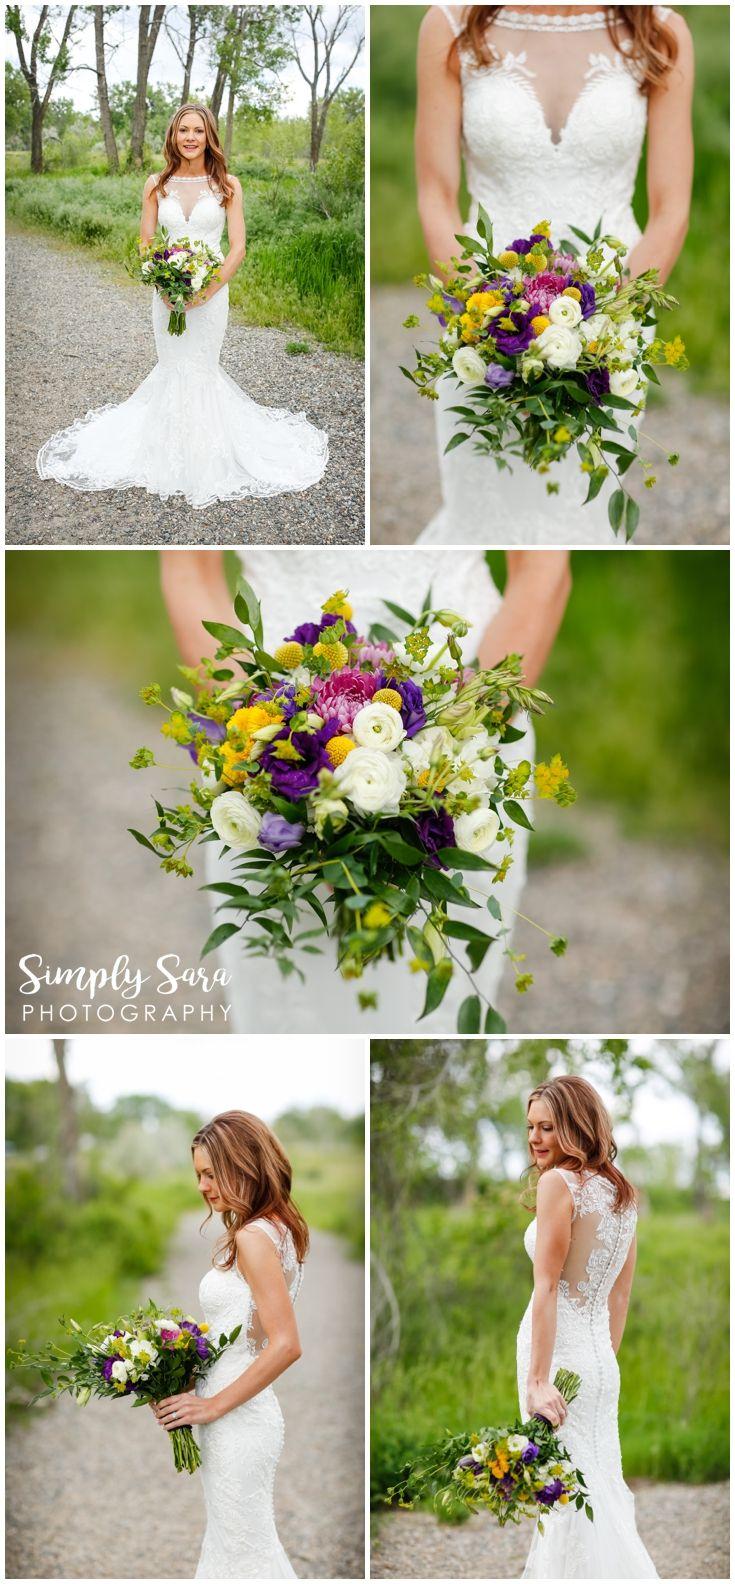 Wedding Photo Ideas & Poses - Bride - Wedding Dress with Lace ...